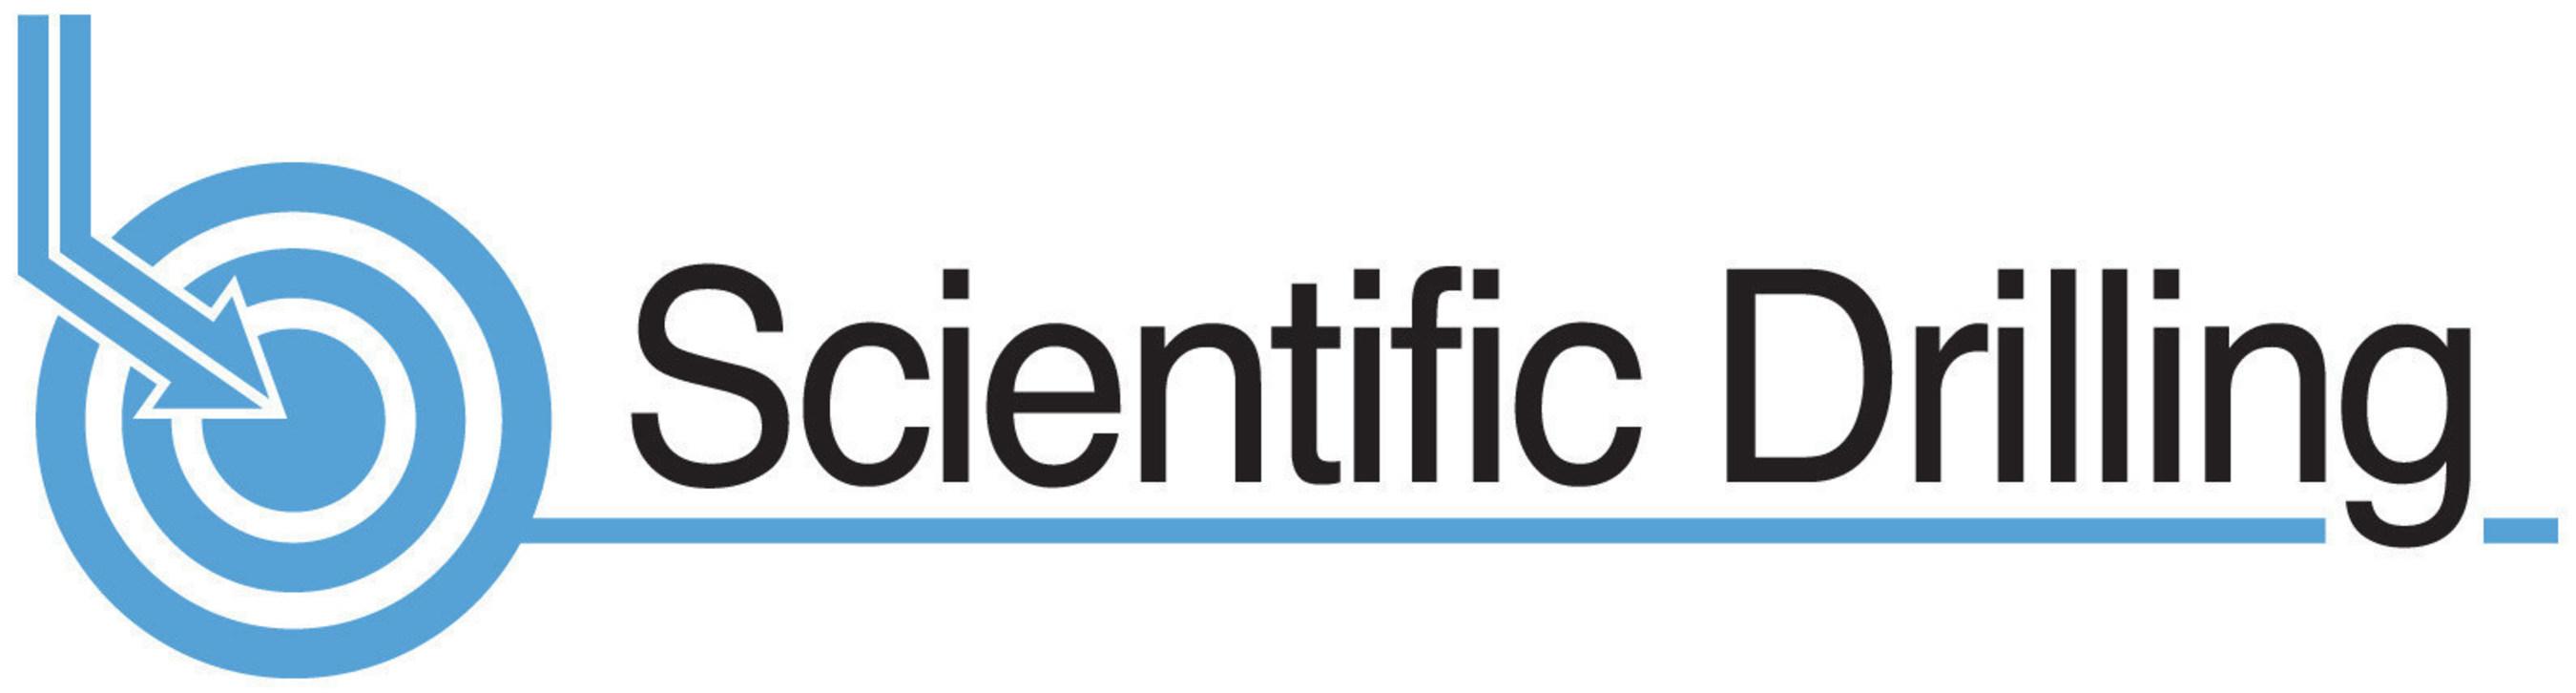 Scientific Drilling International